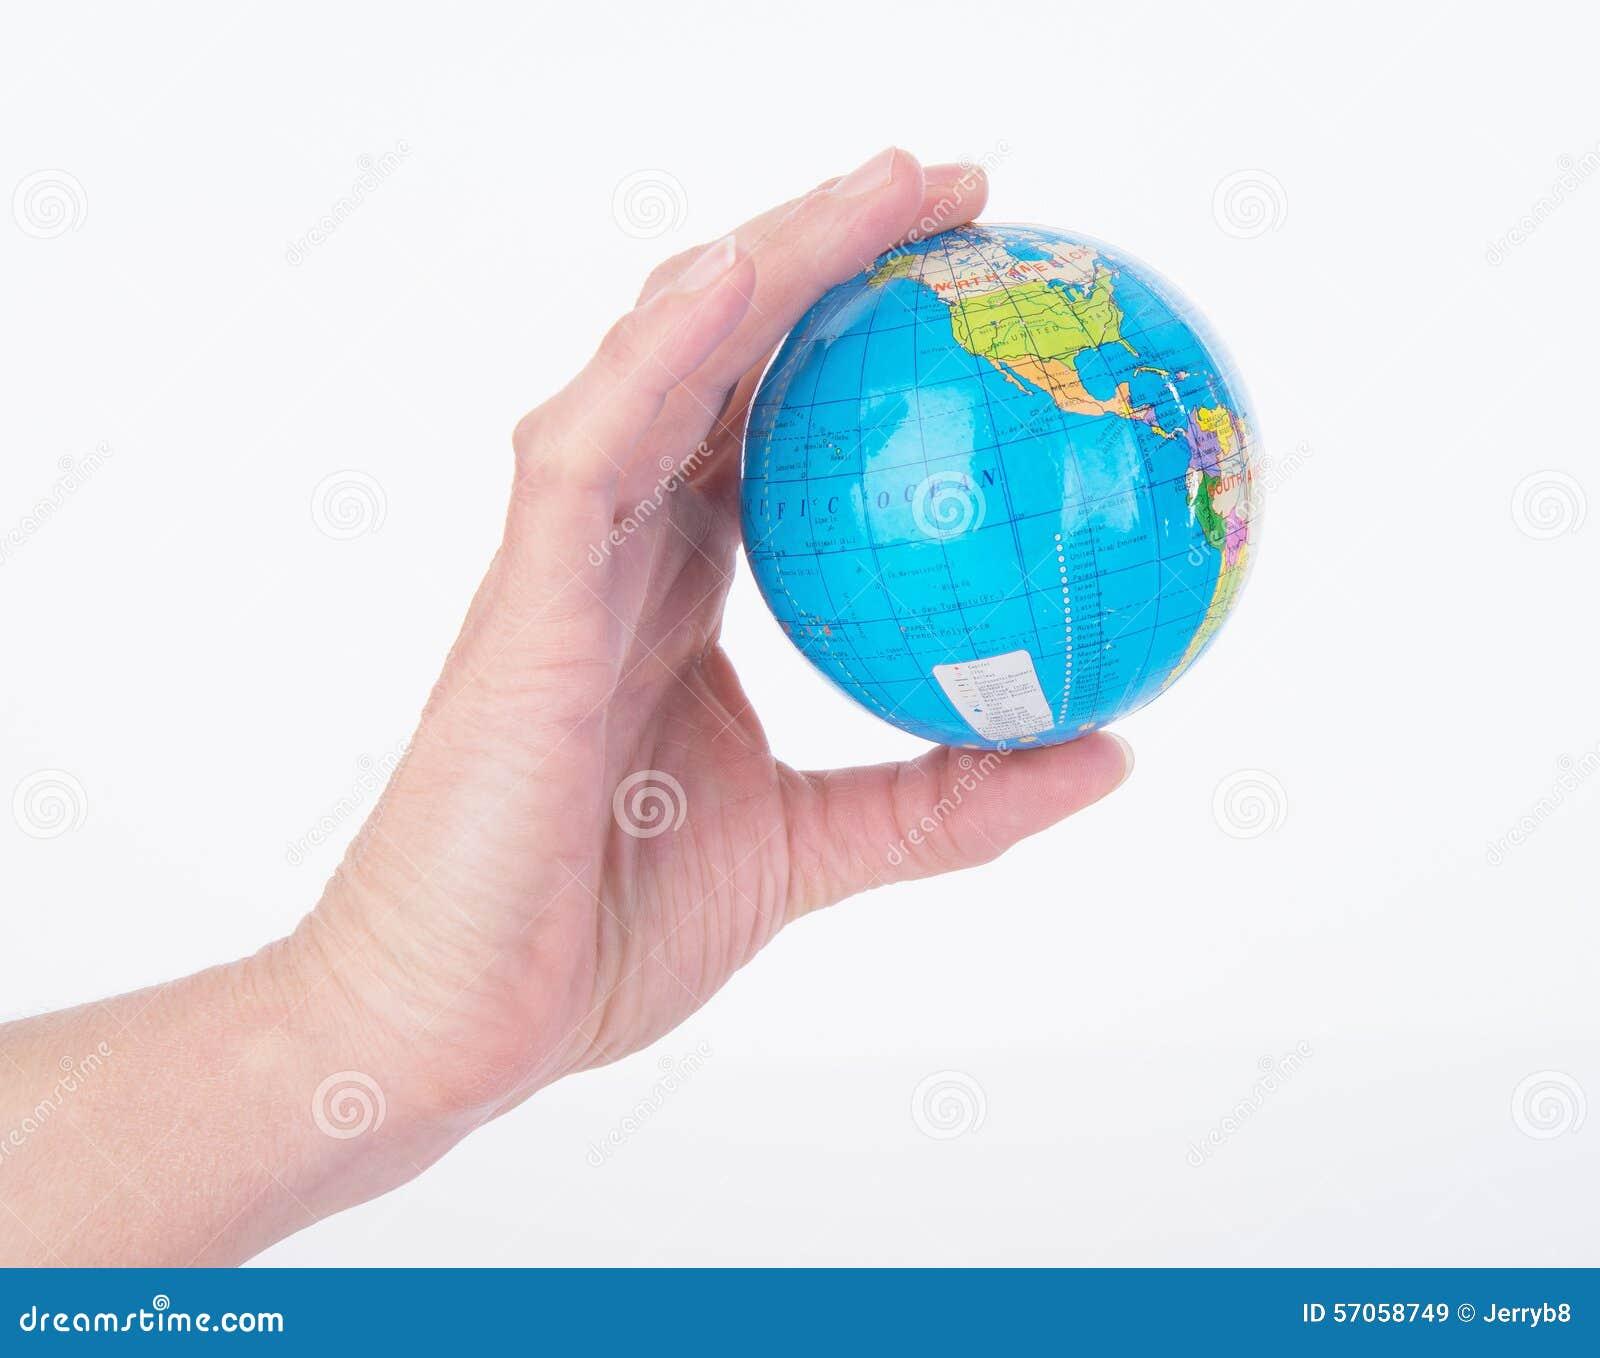 Mini World Map.Mini World Globe Stock Image Image Of Science Revolving 57058749